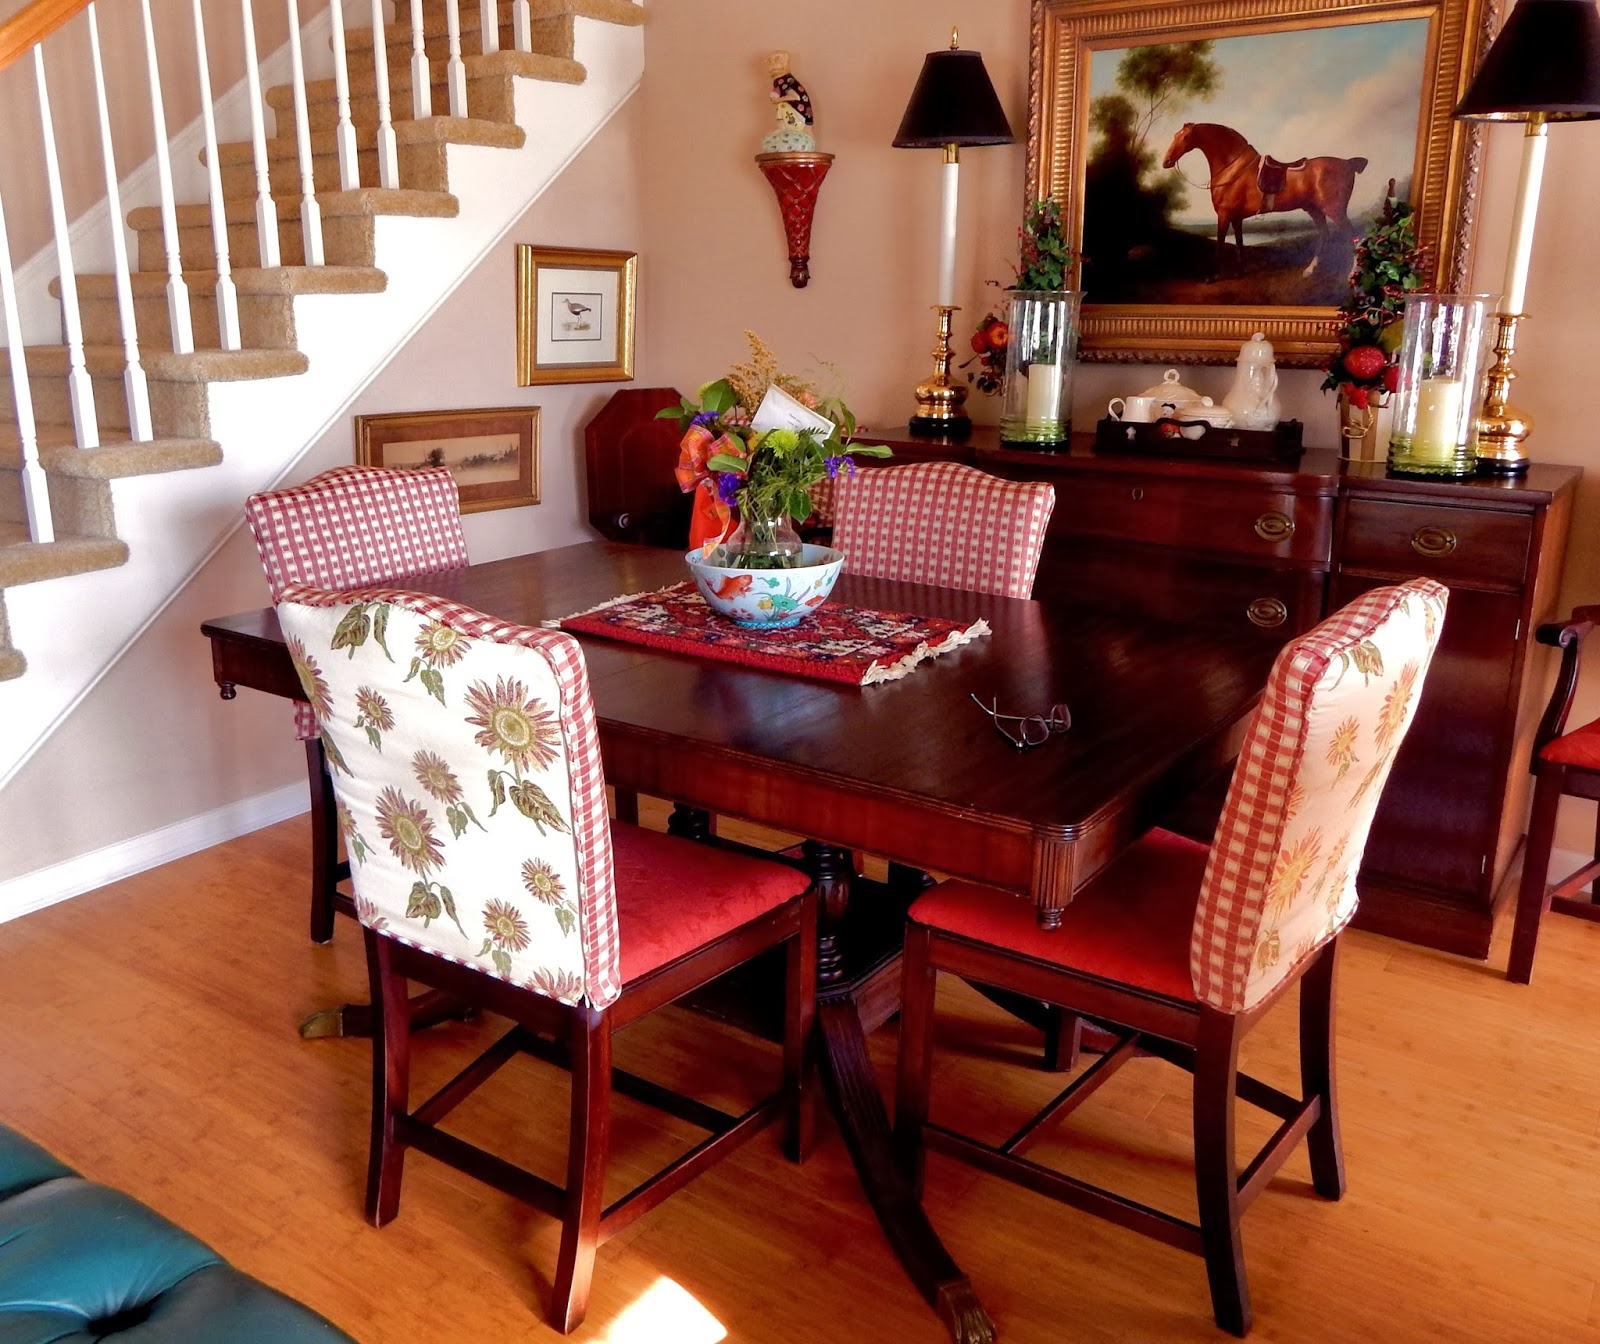 Habitat Dining Room Chair Covers Ergonomic Sale Pam Morris Sews Slipcovers